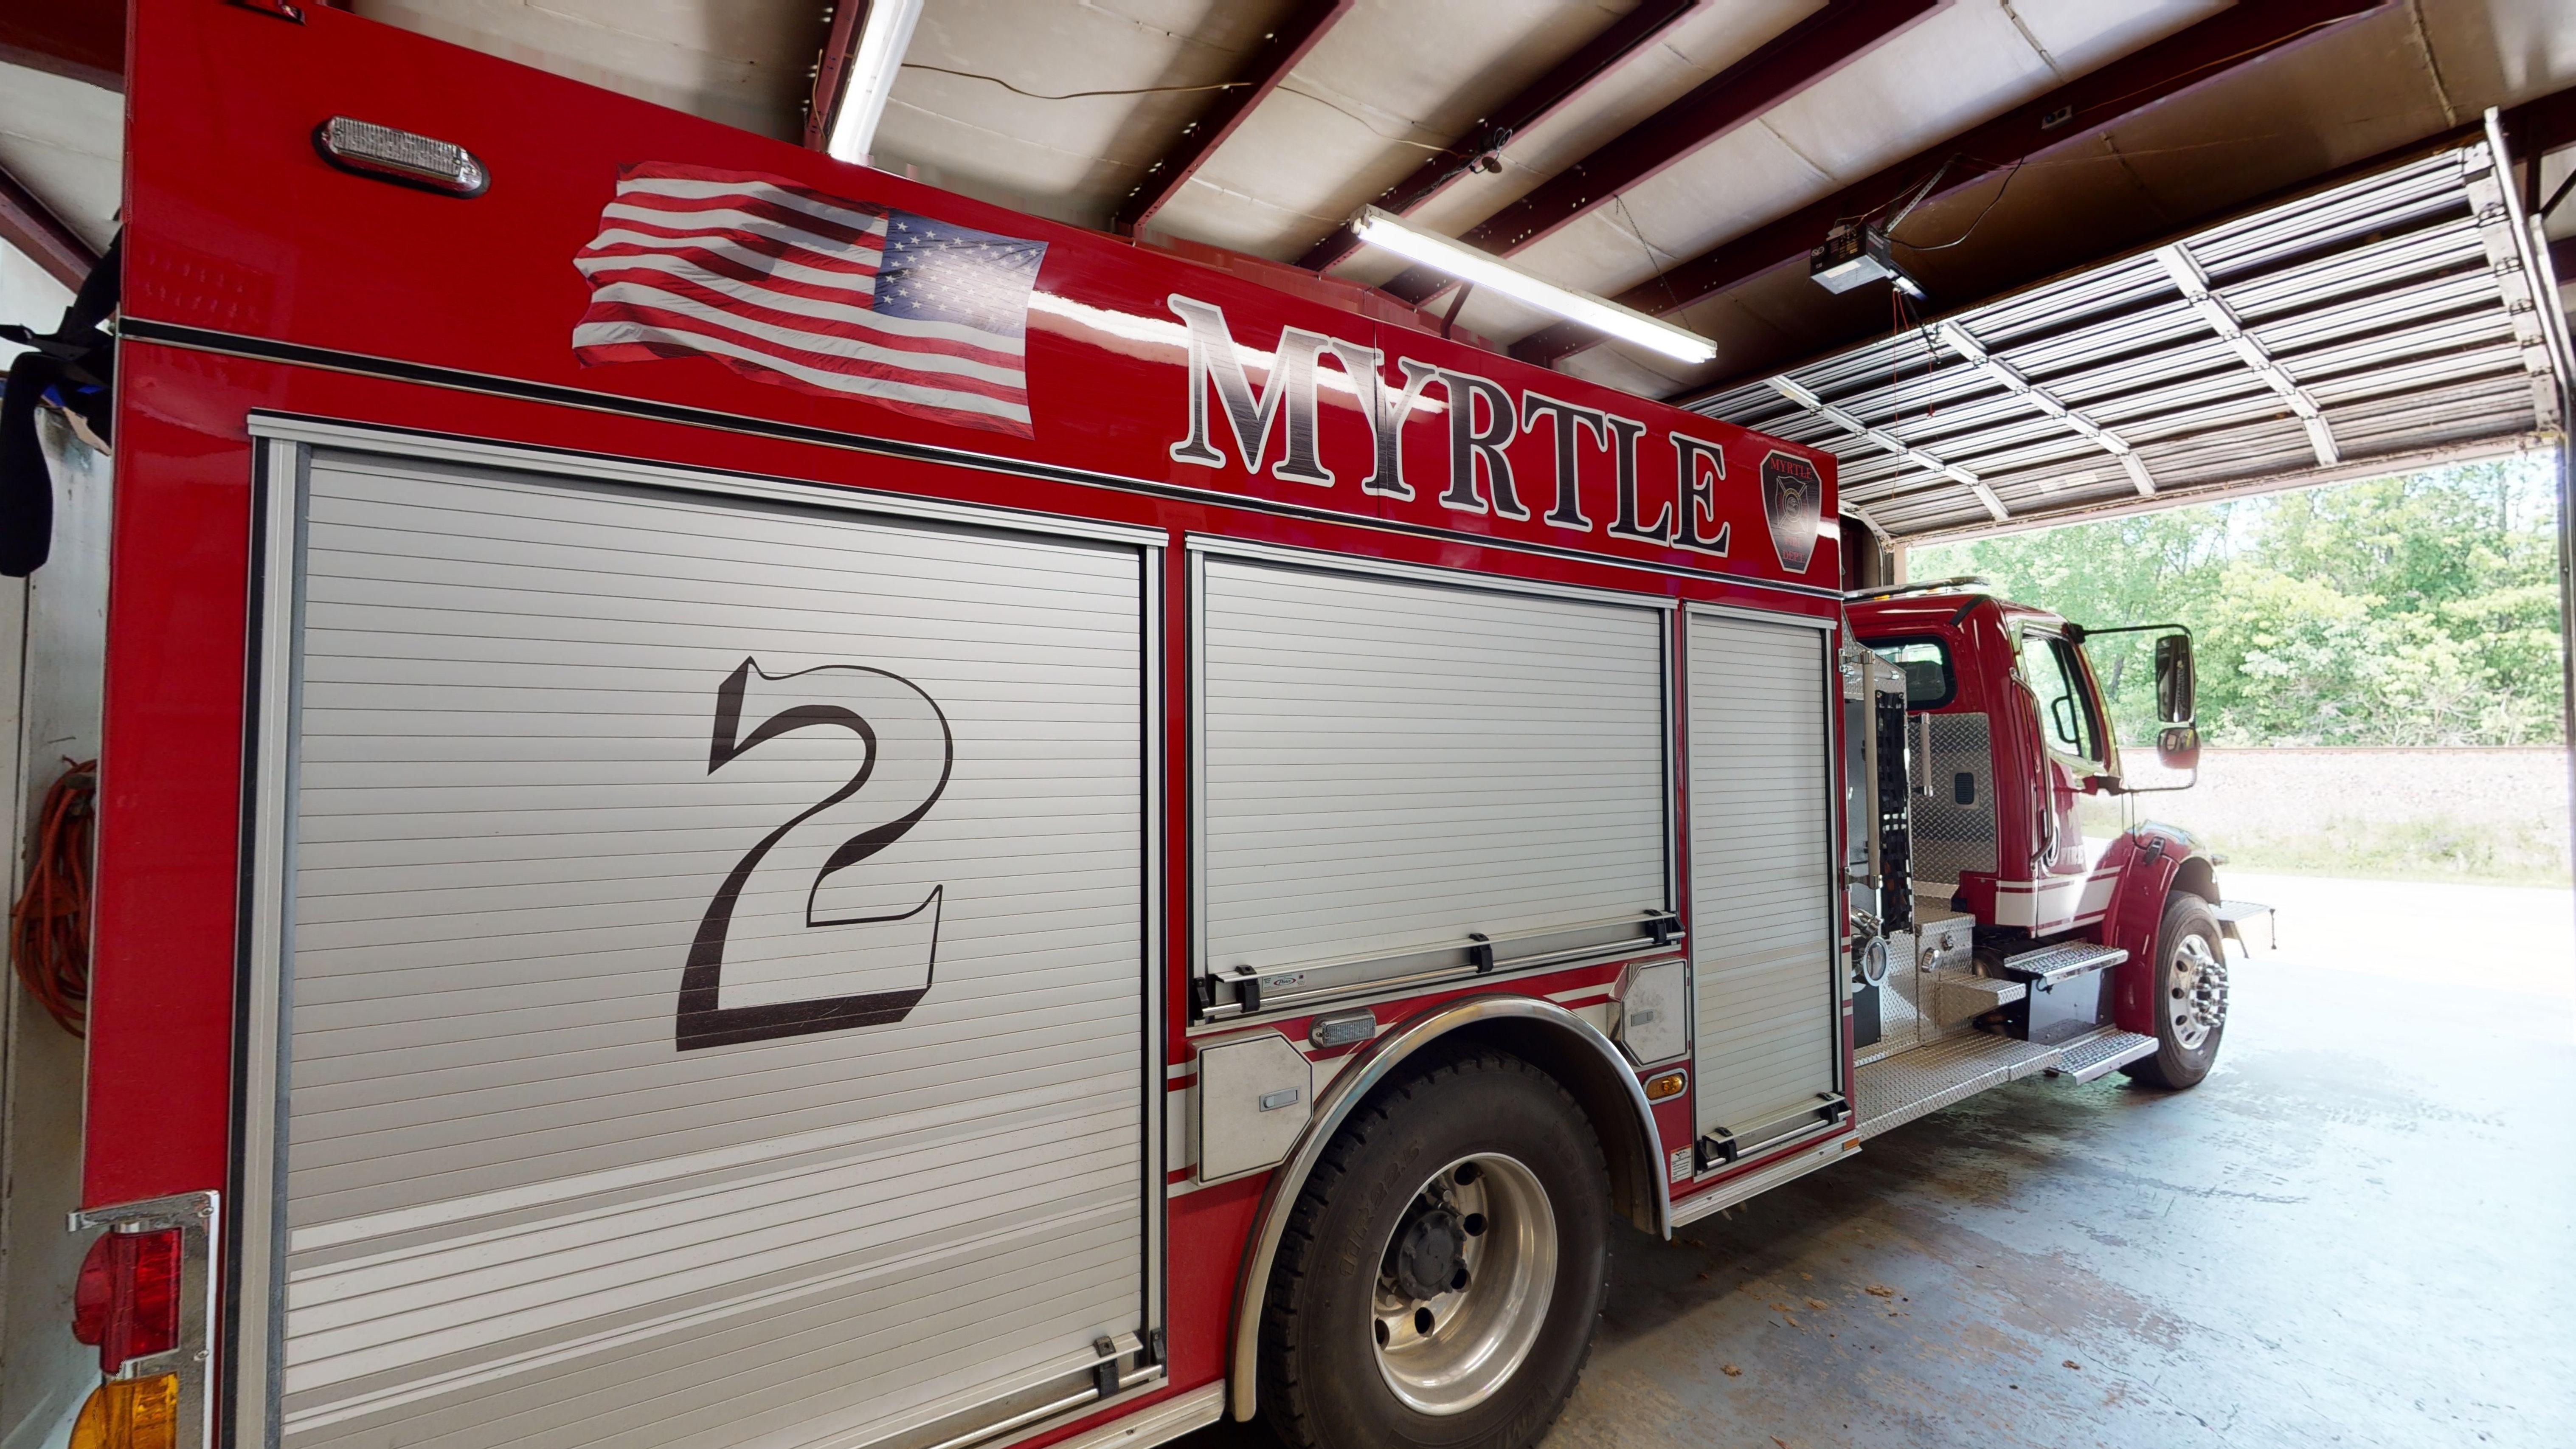 2_Myrtle-FD-Commercial-Pumper-05282021_121102